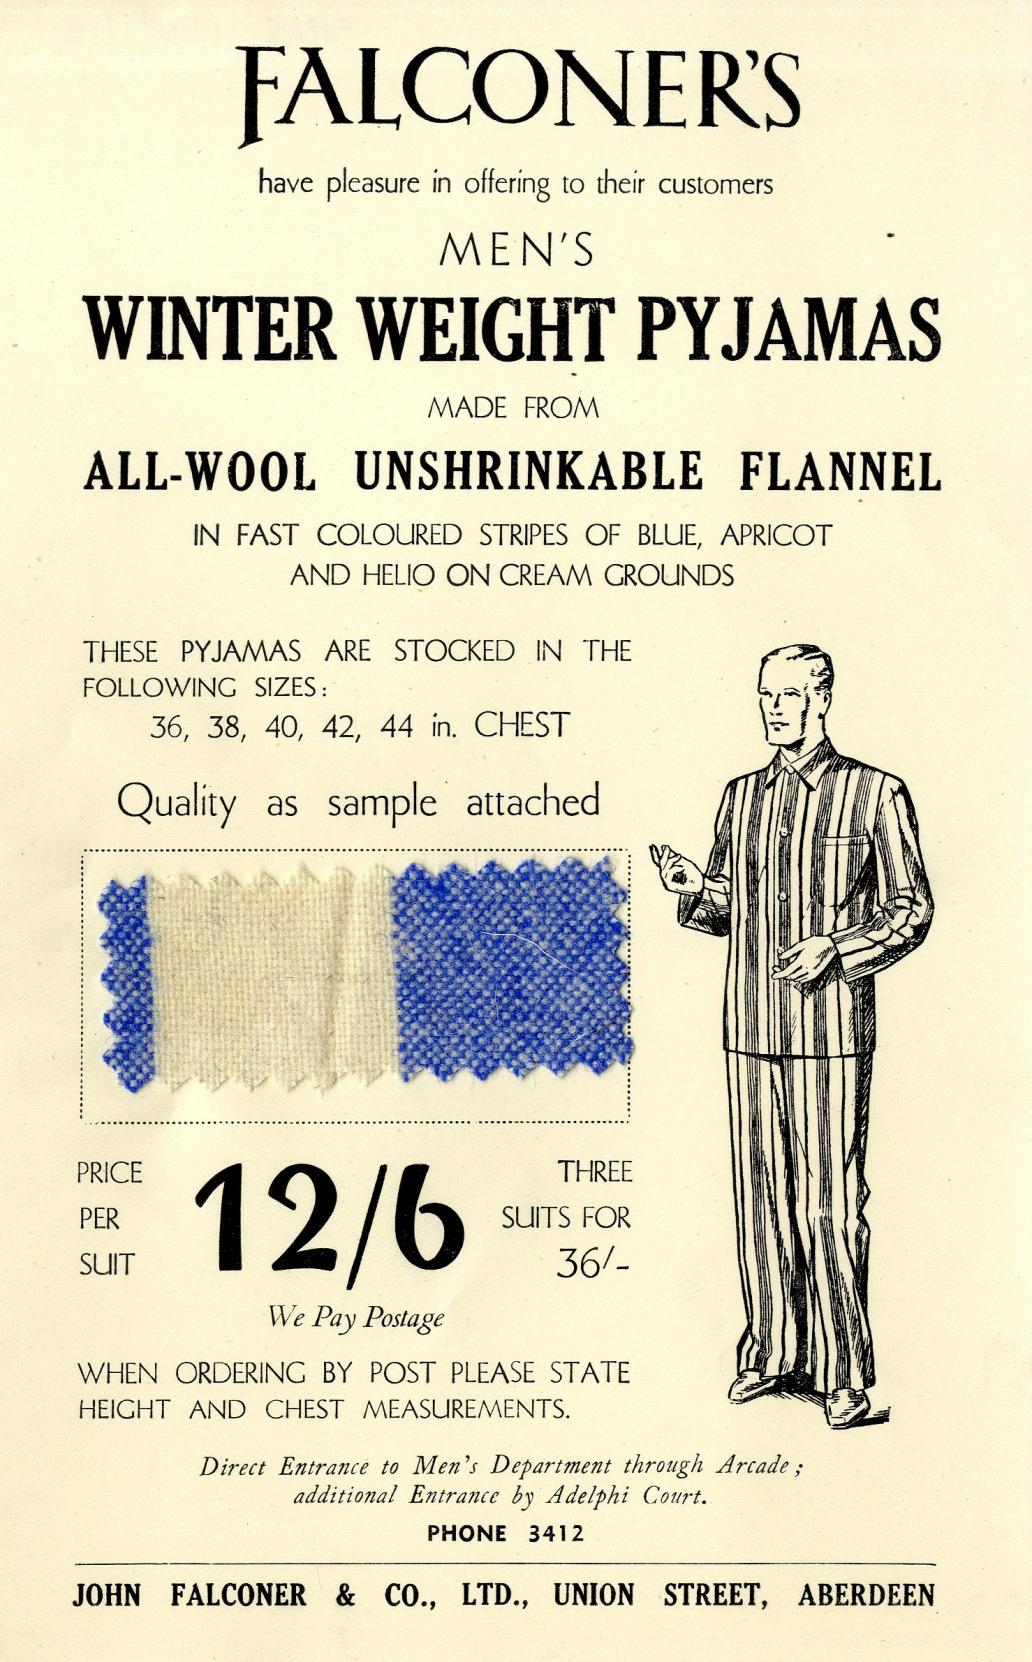 FRAS 145-1-18_john_falconer_leaflet_textile_swatch_mens_pyjamas.jpg